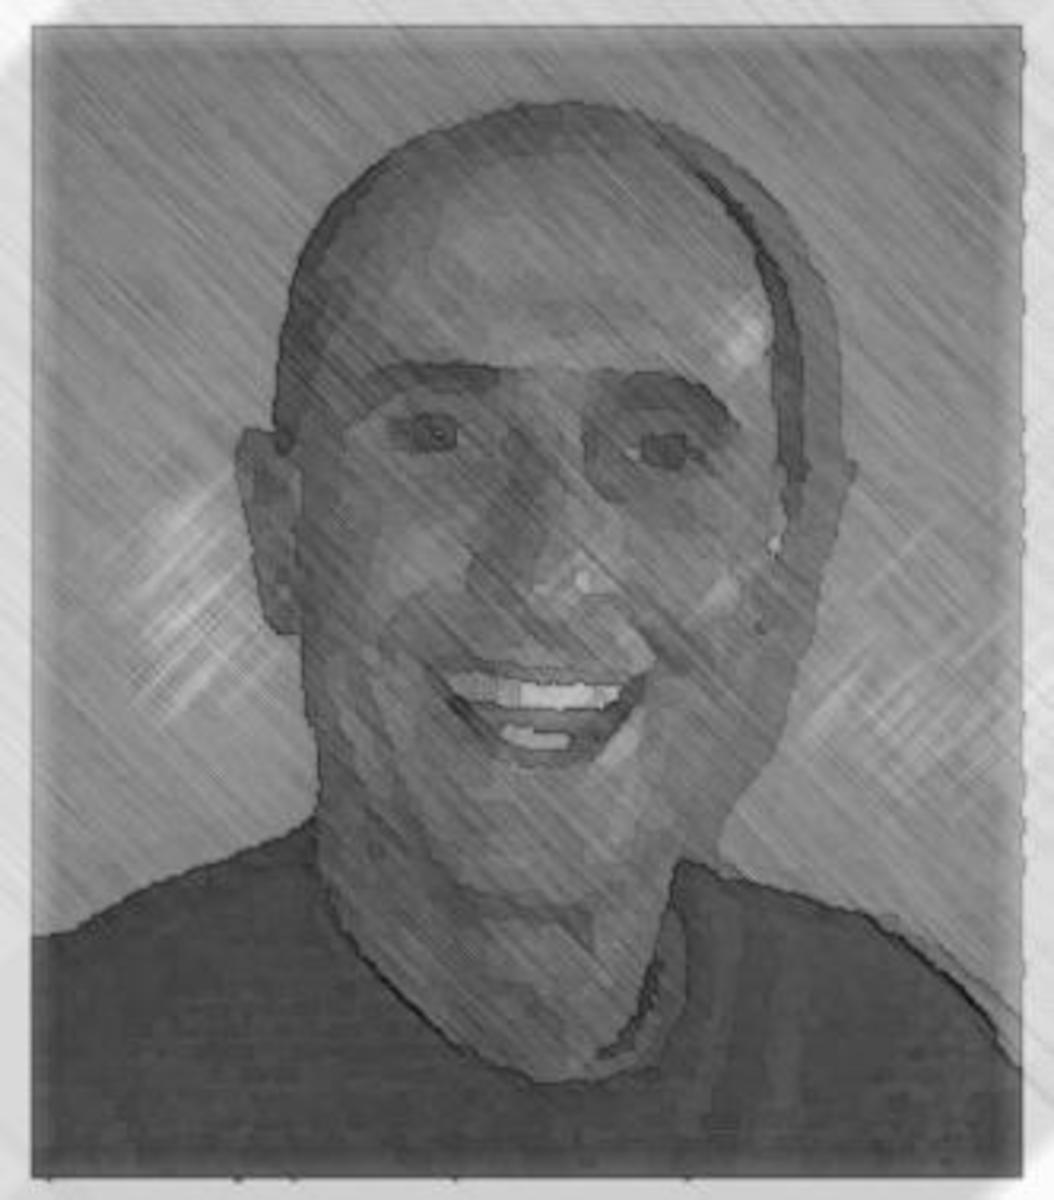 Self portrain of Graham Farrel